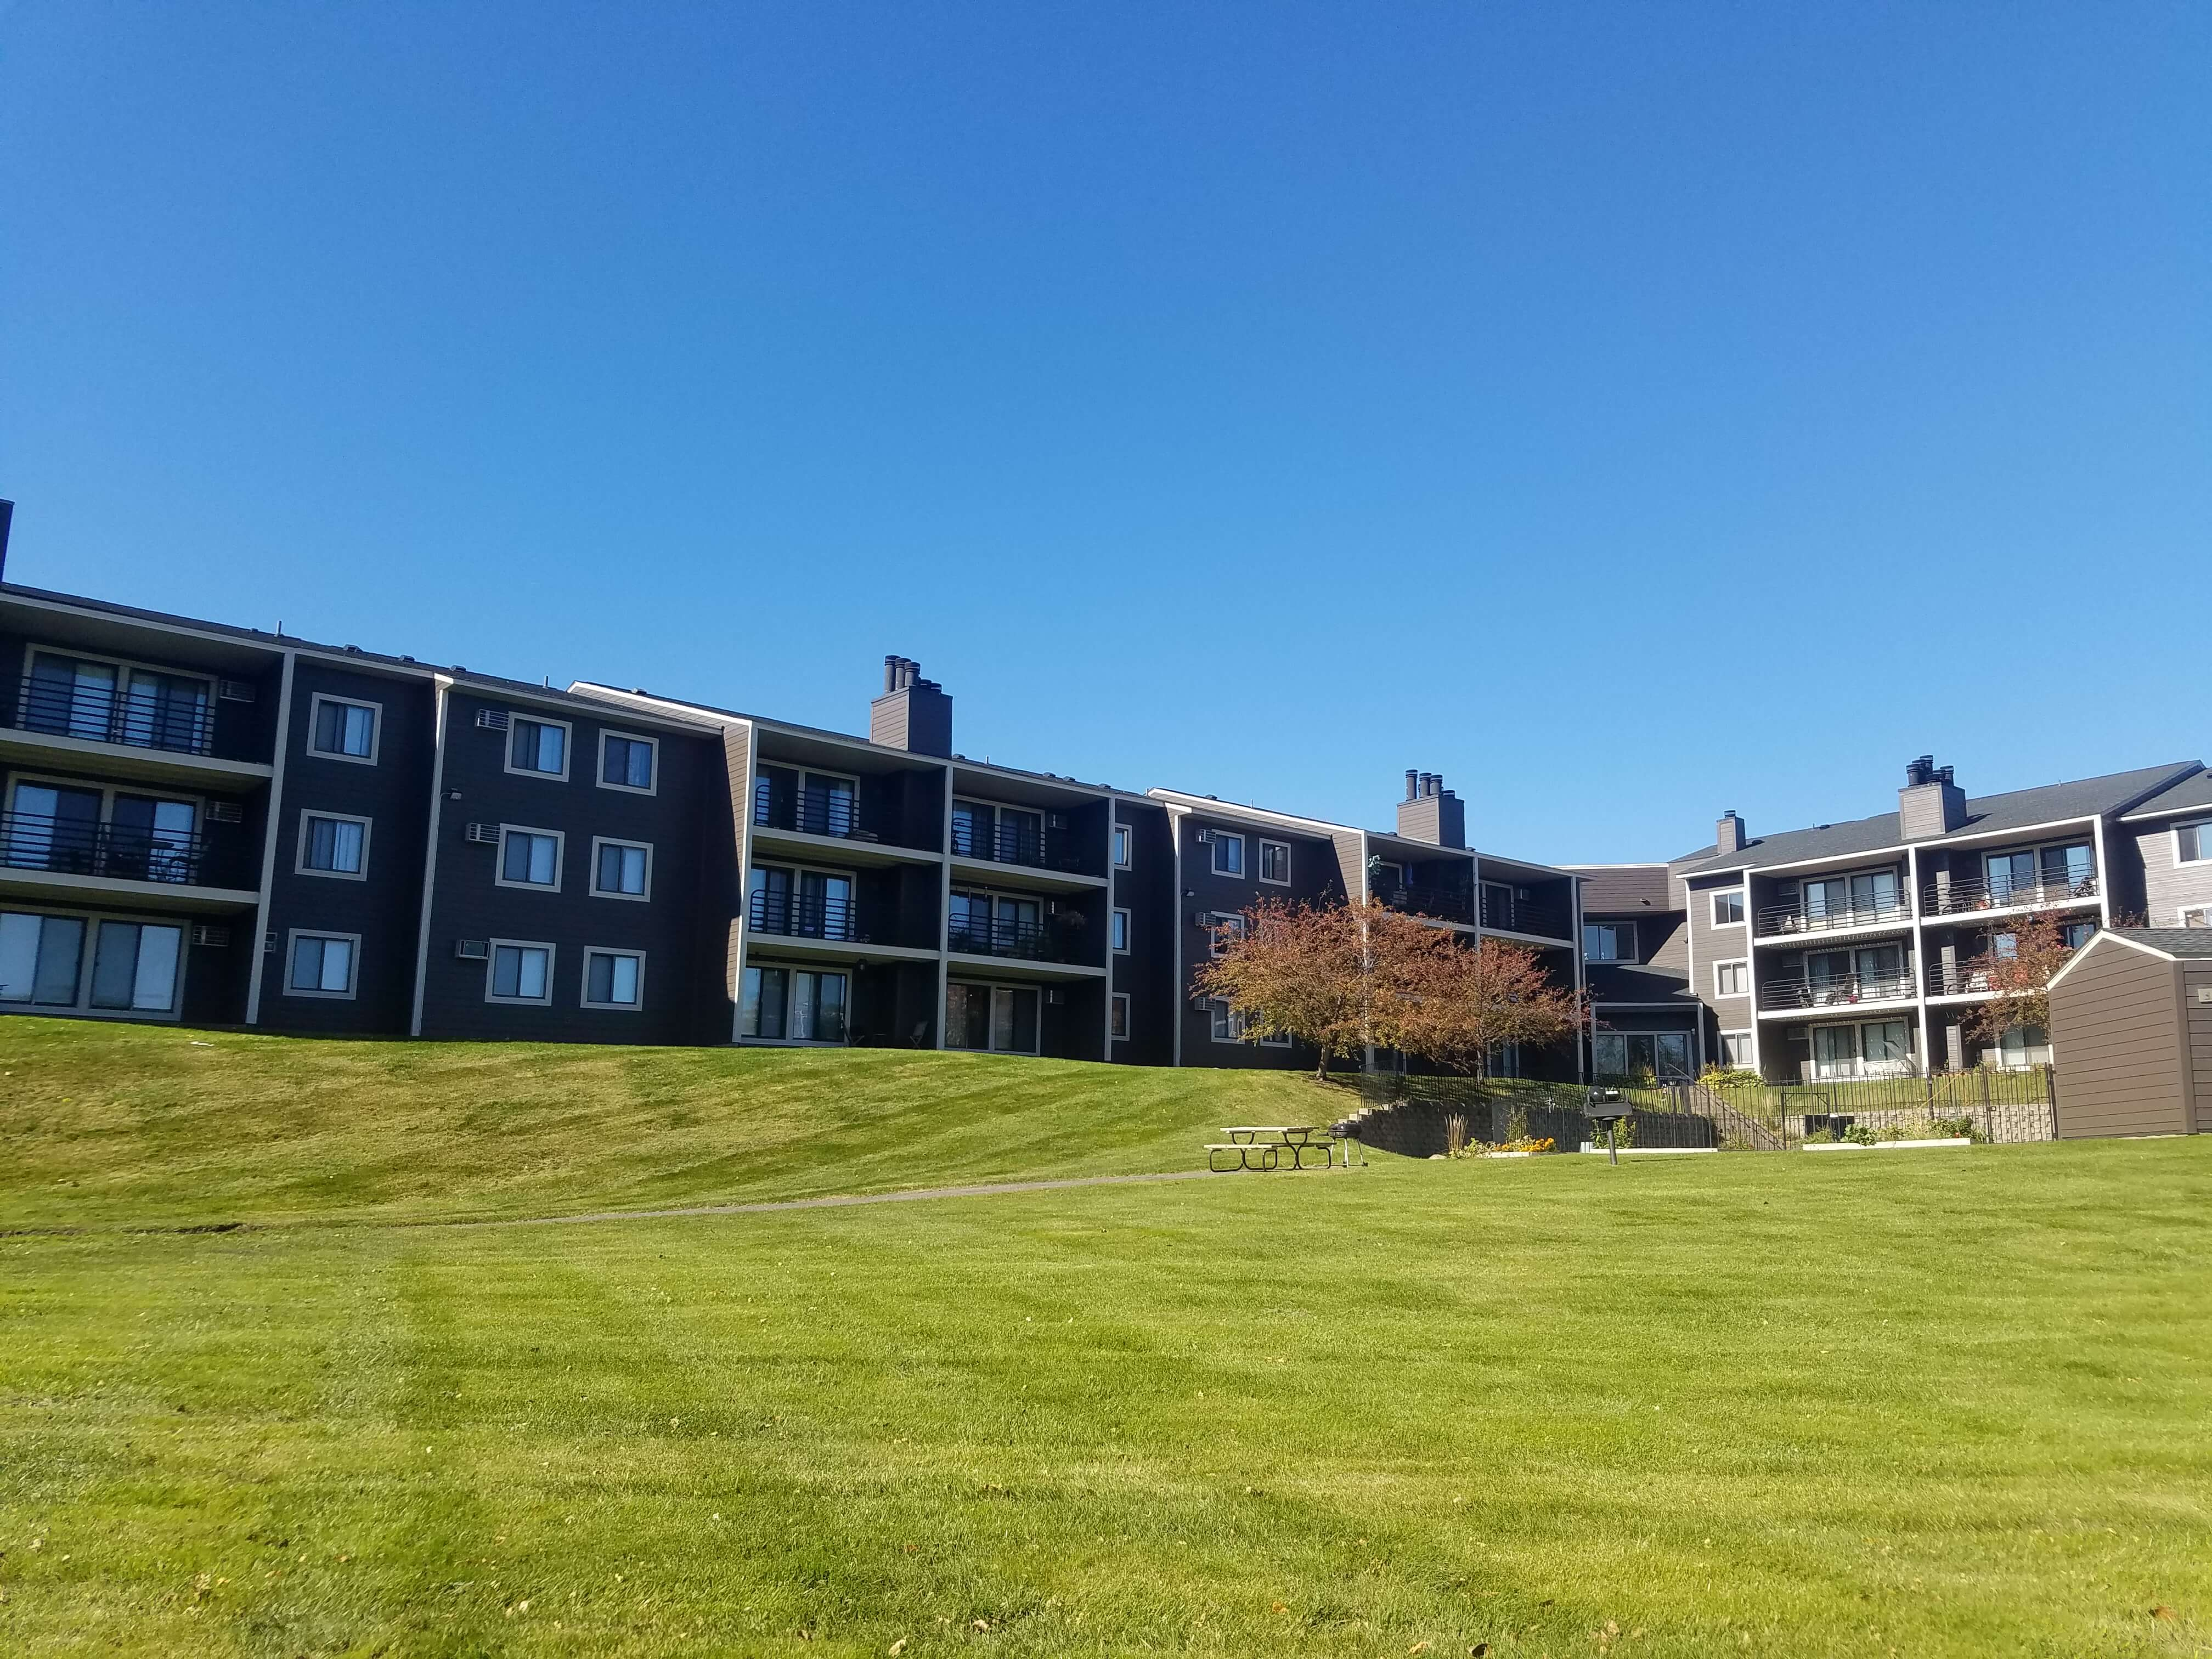 Basswood Trails Apartments